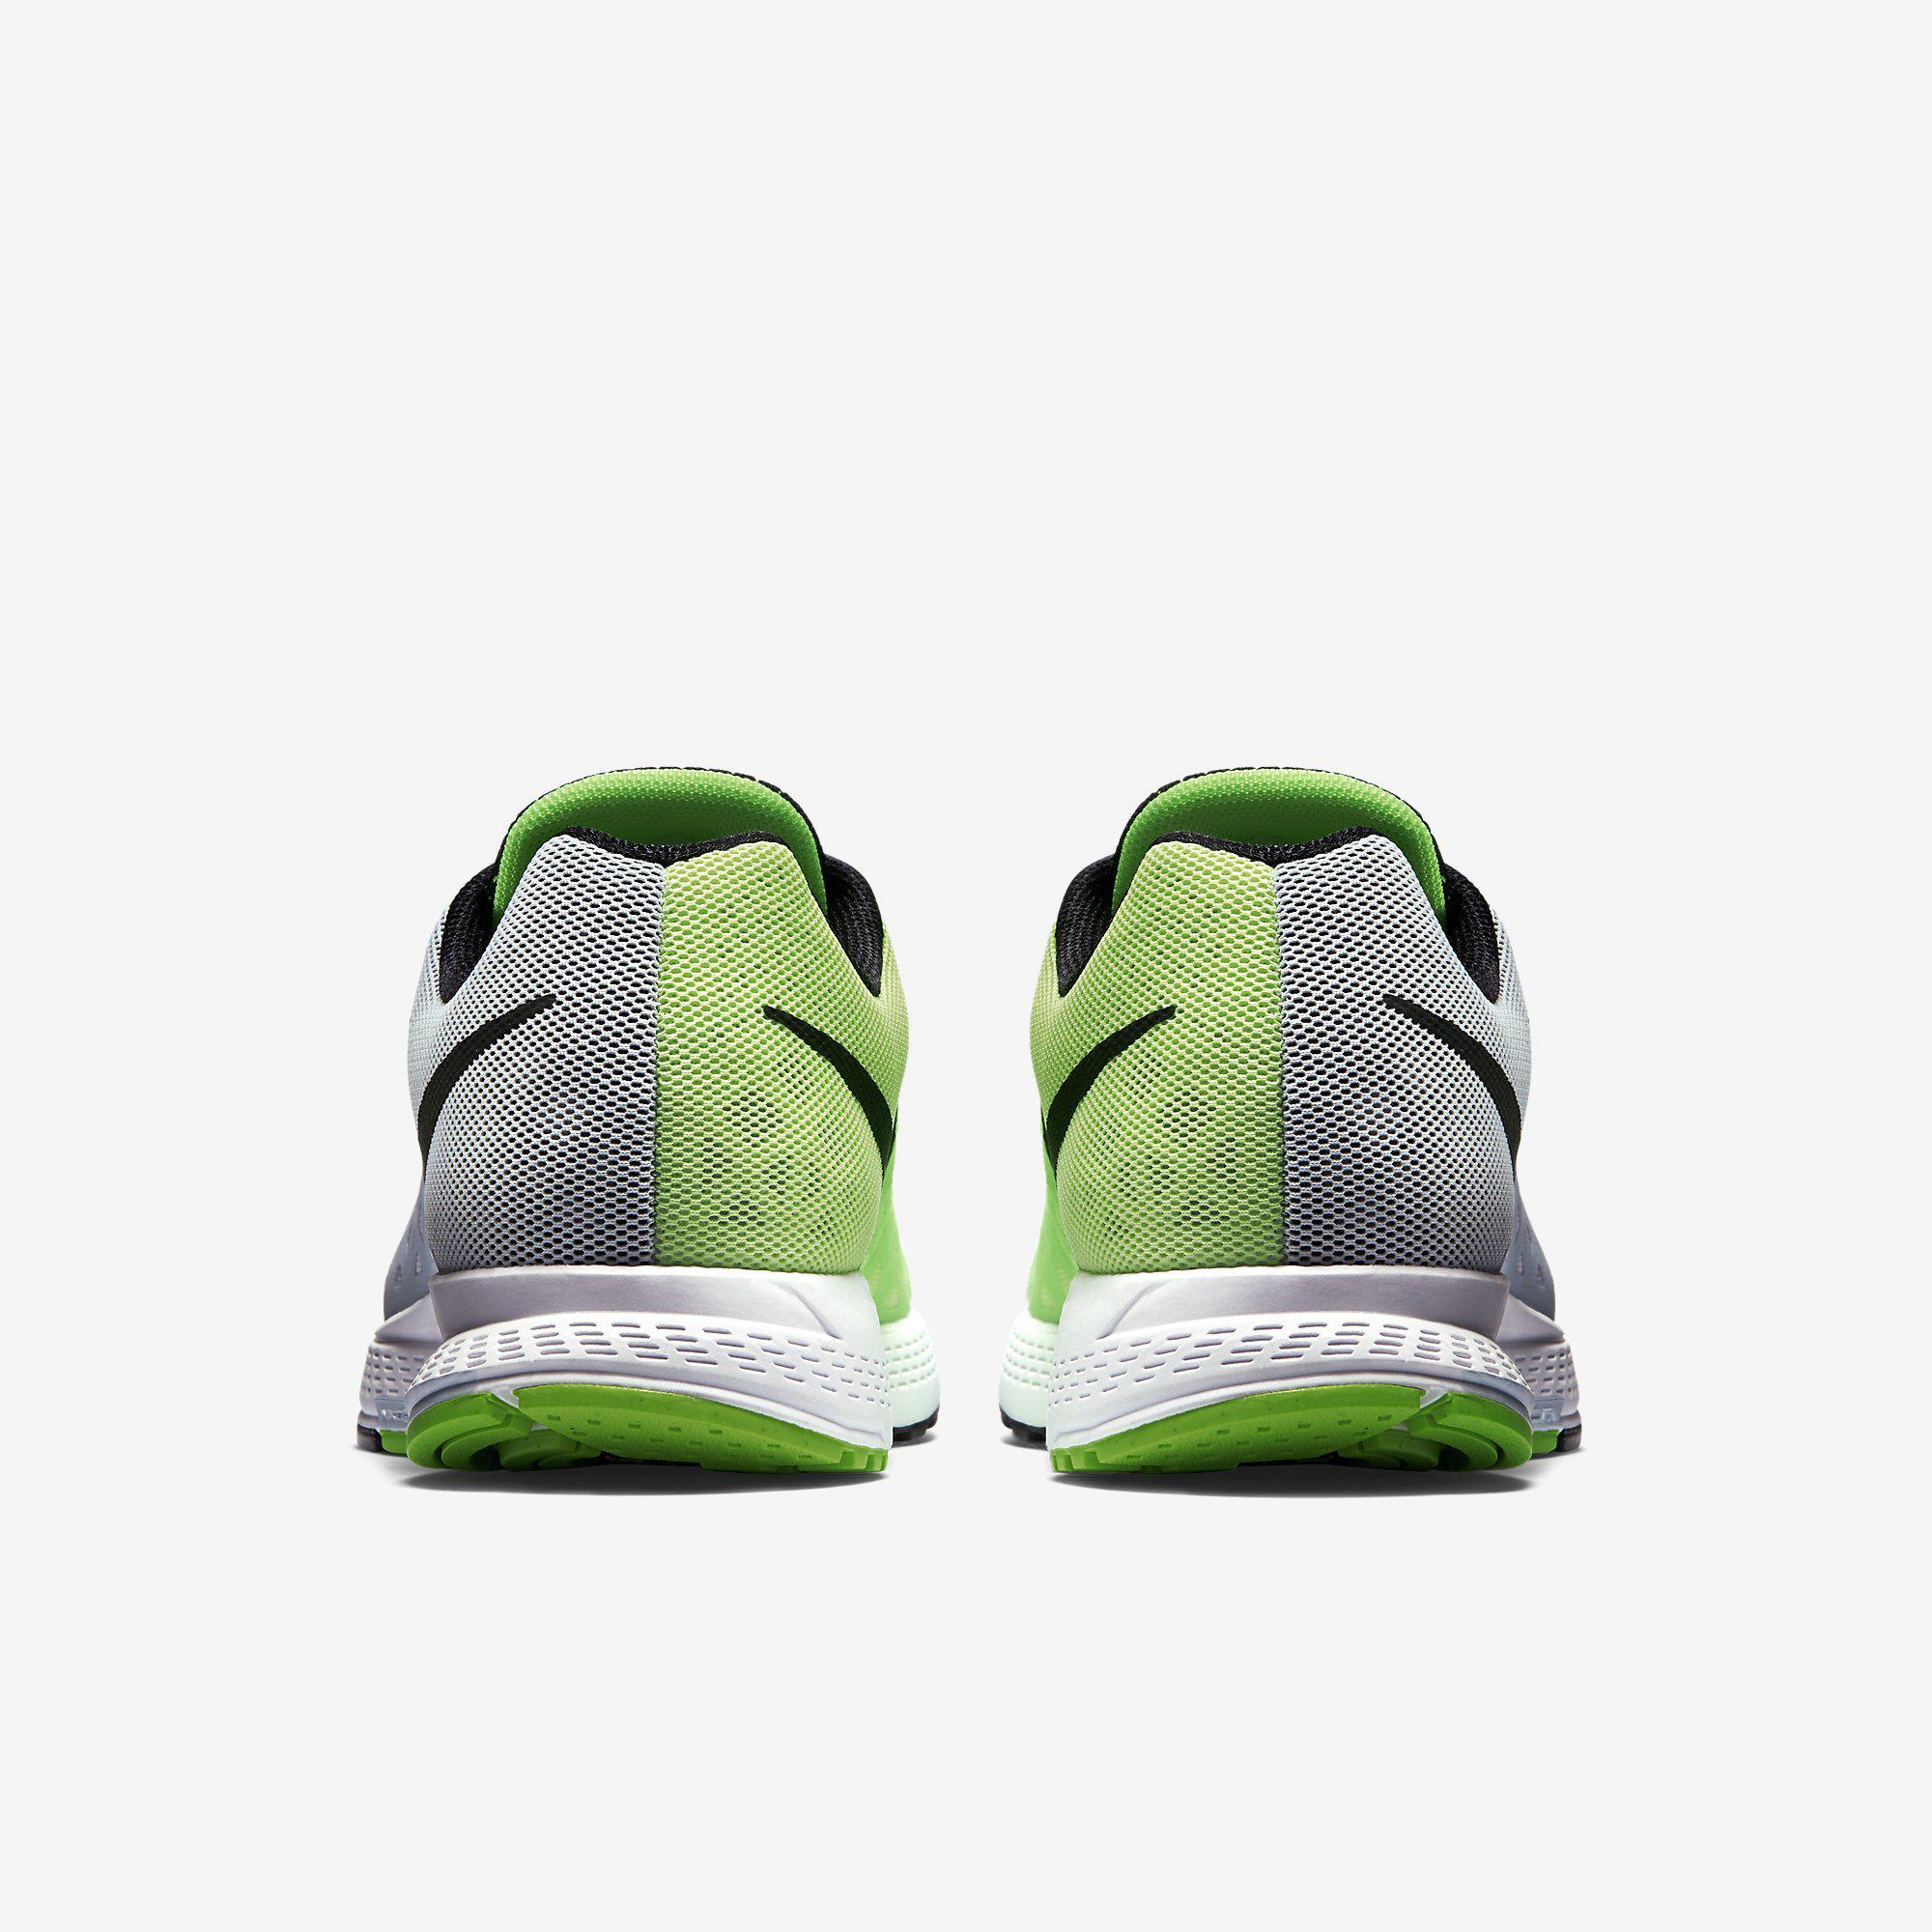 Nike Zoom Air Pegasus 31 De Abierto De Australia 2018 Mujeres sl1lWK1C5X